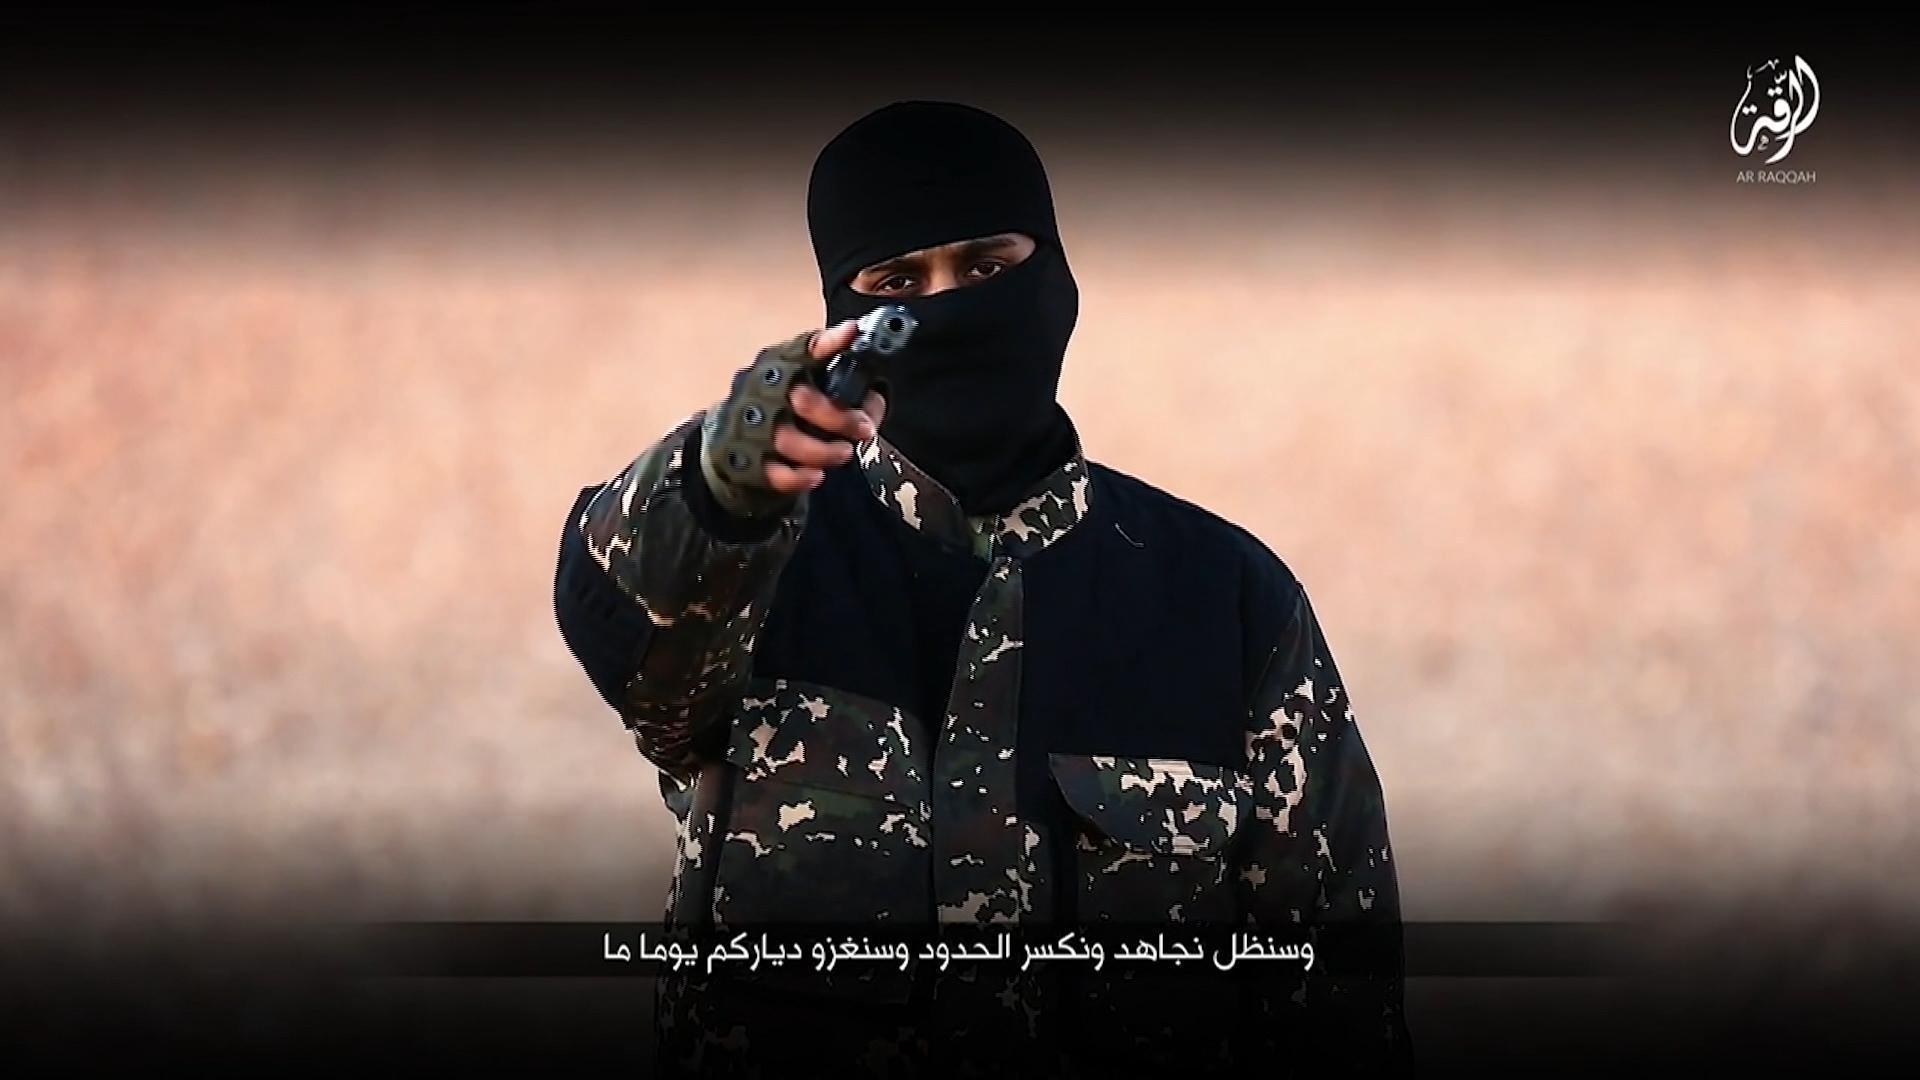 Latest Islamic State execution video features new 'Jihadi John'